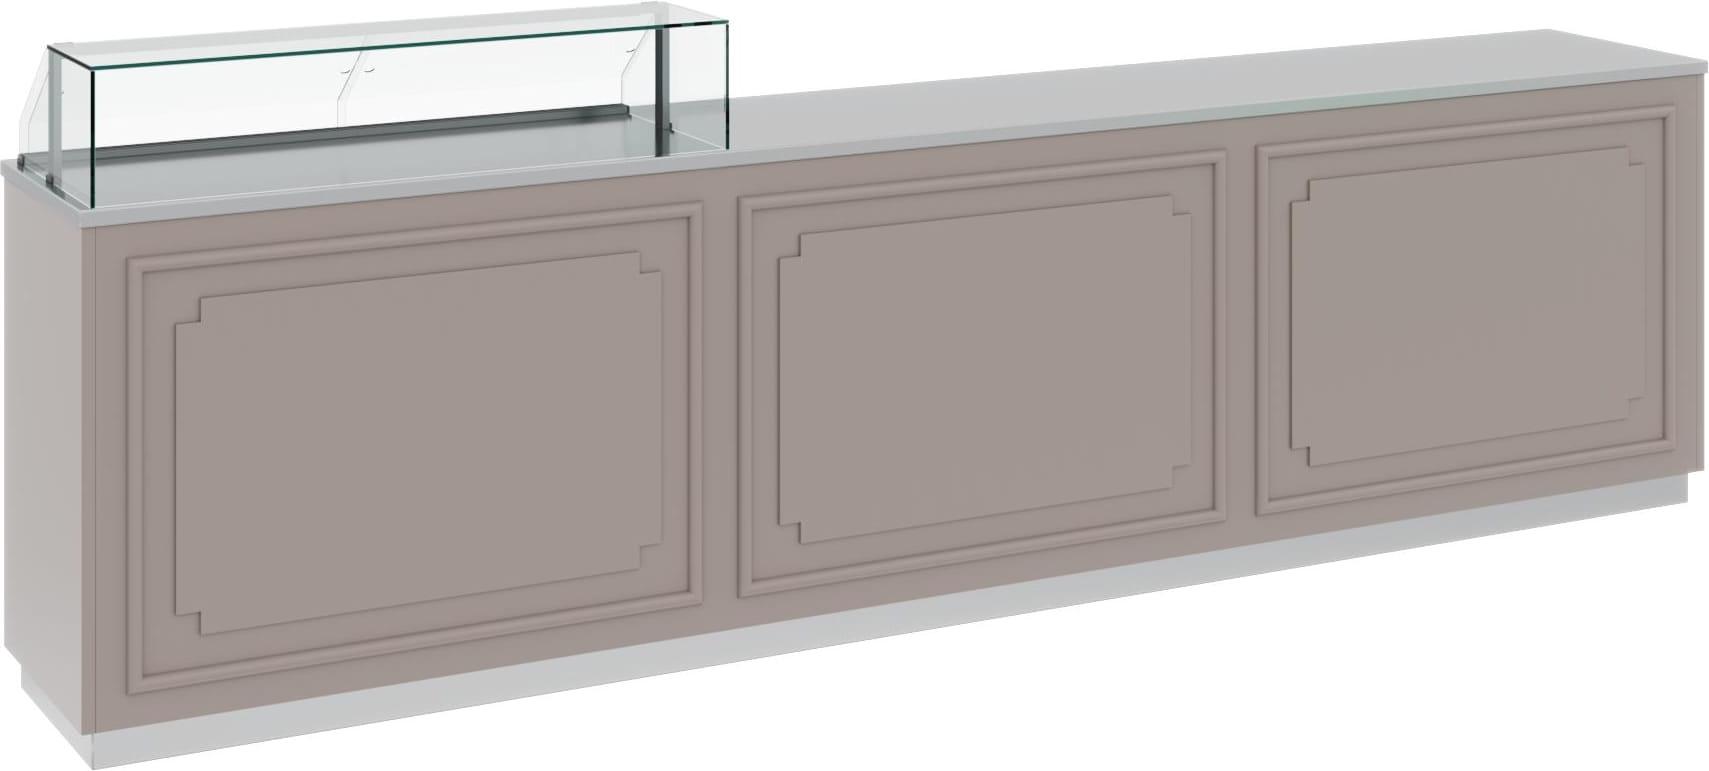 Нейтральная витрина CARBOMA OMI AC40N 2.0-1 - 1